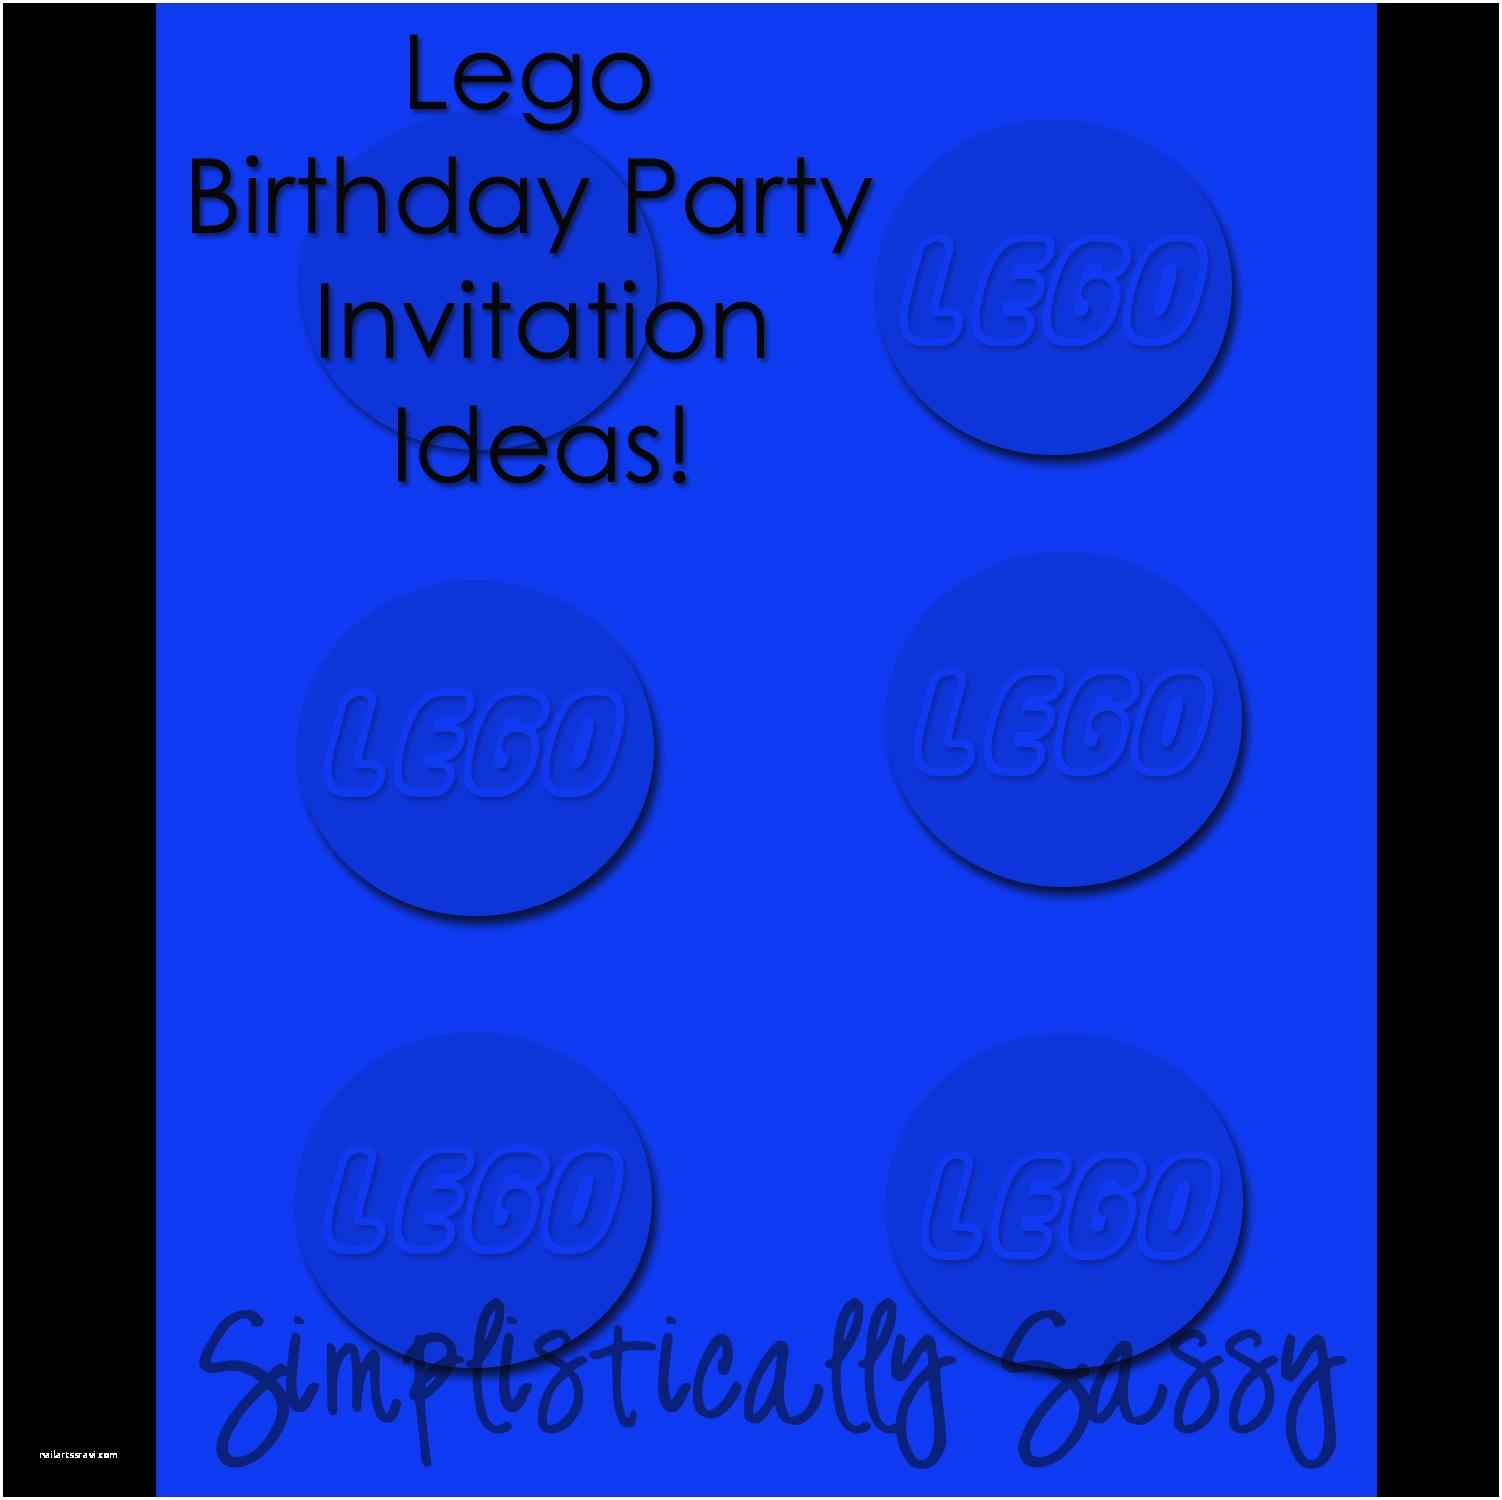 Lego Birthday Party Invitations Lego Birthday Party Invitations by Simplistically Sassy